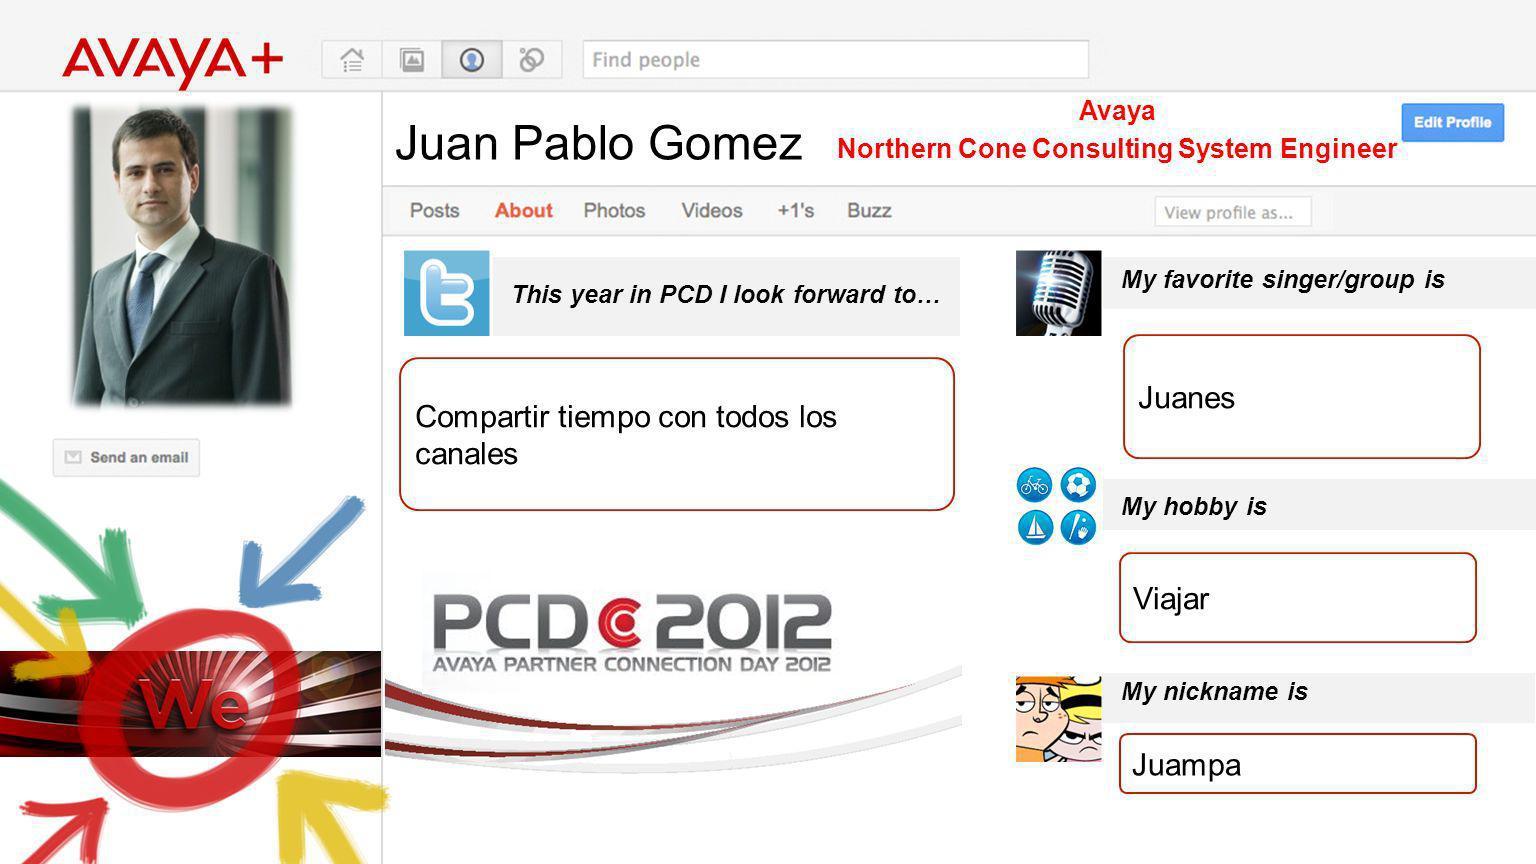 Juan Pablo Gomez This year in PCD I look forward to… Avaya Northern Cone Consulting System Engineer Compartir tiempo con todos los canales My favorite